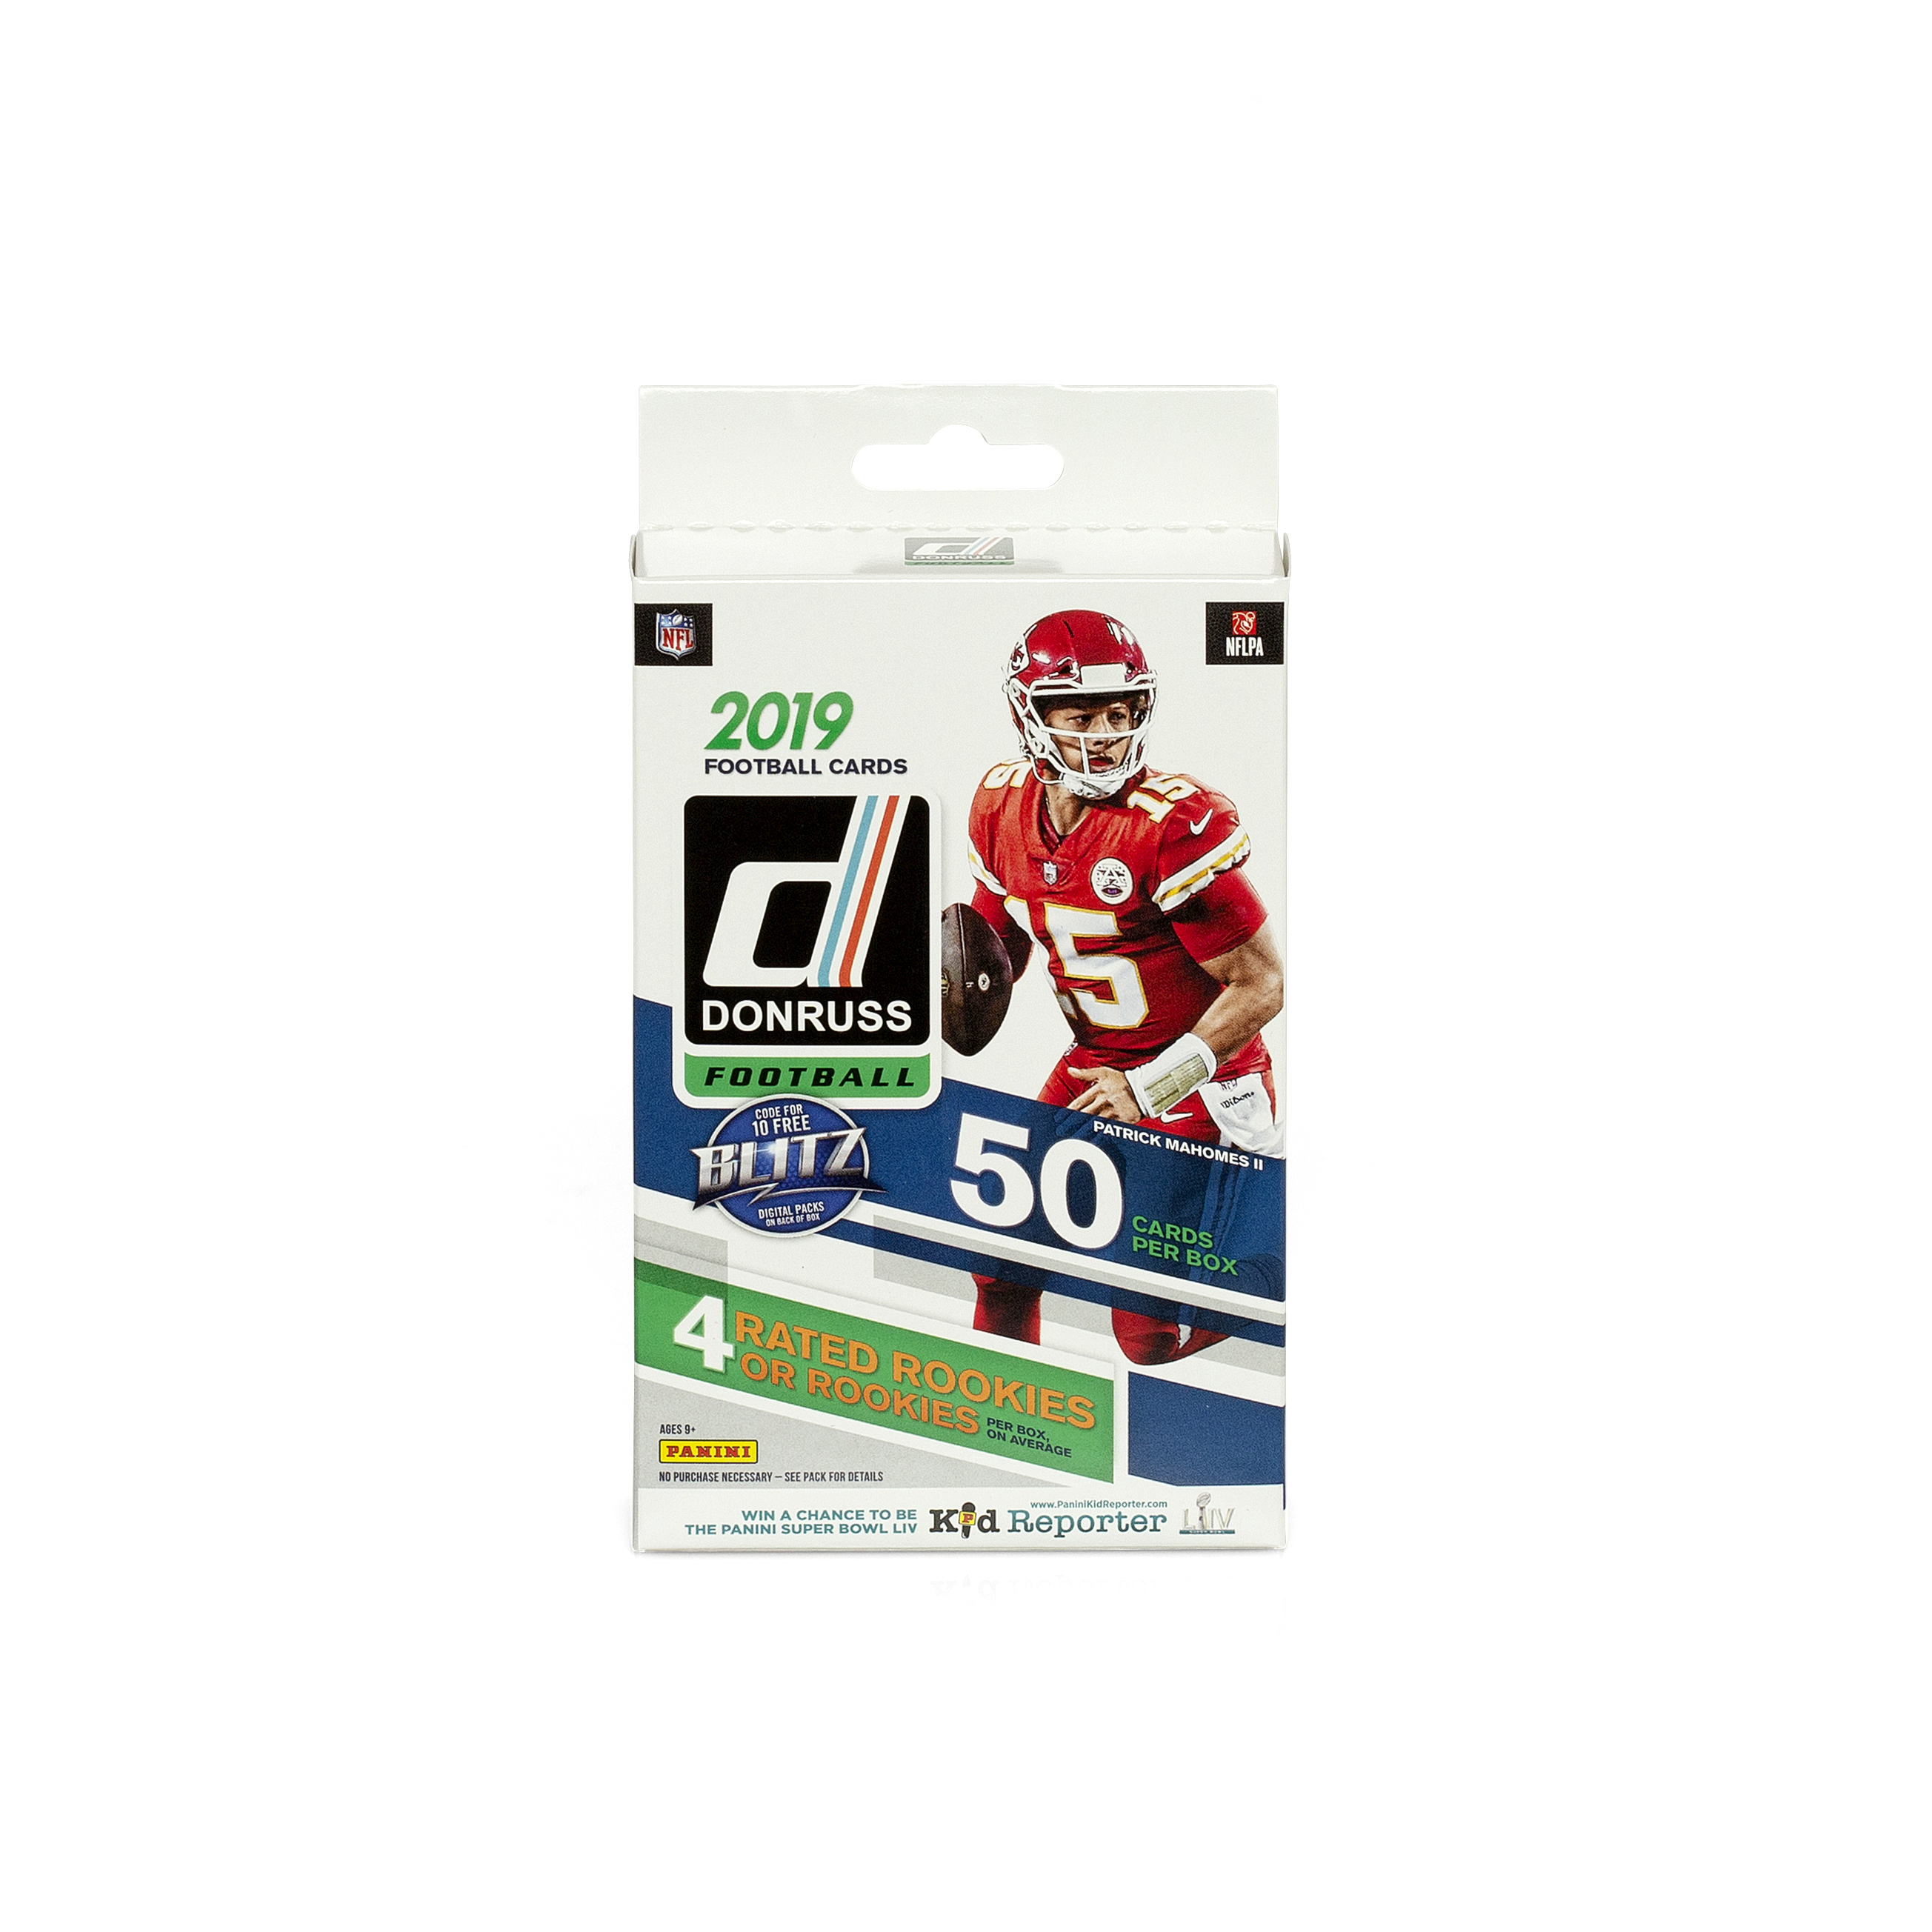 Donruss 2019 Football Cards Hanger Box 50 Cards Per Box